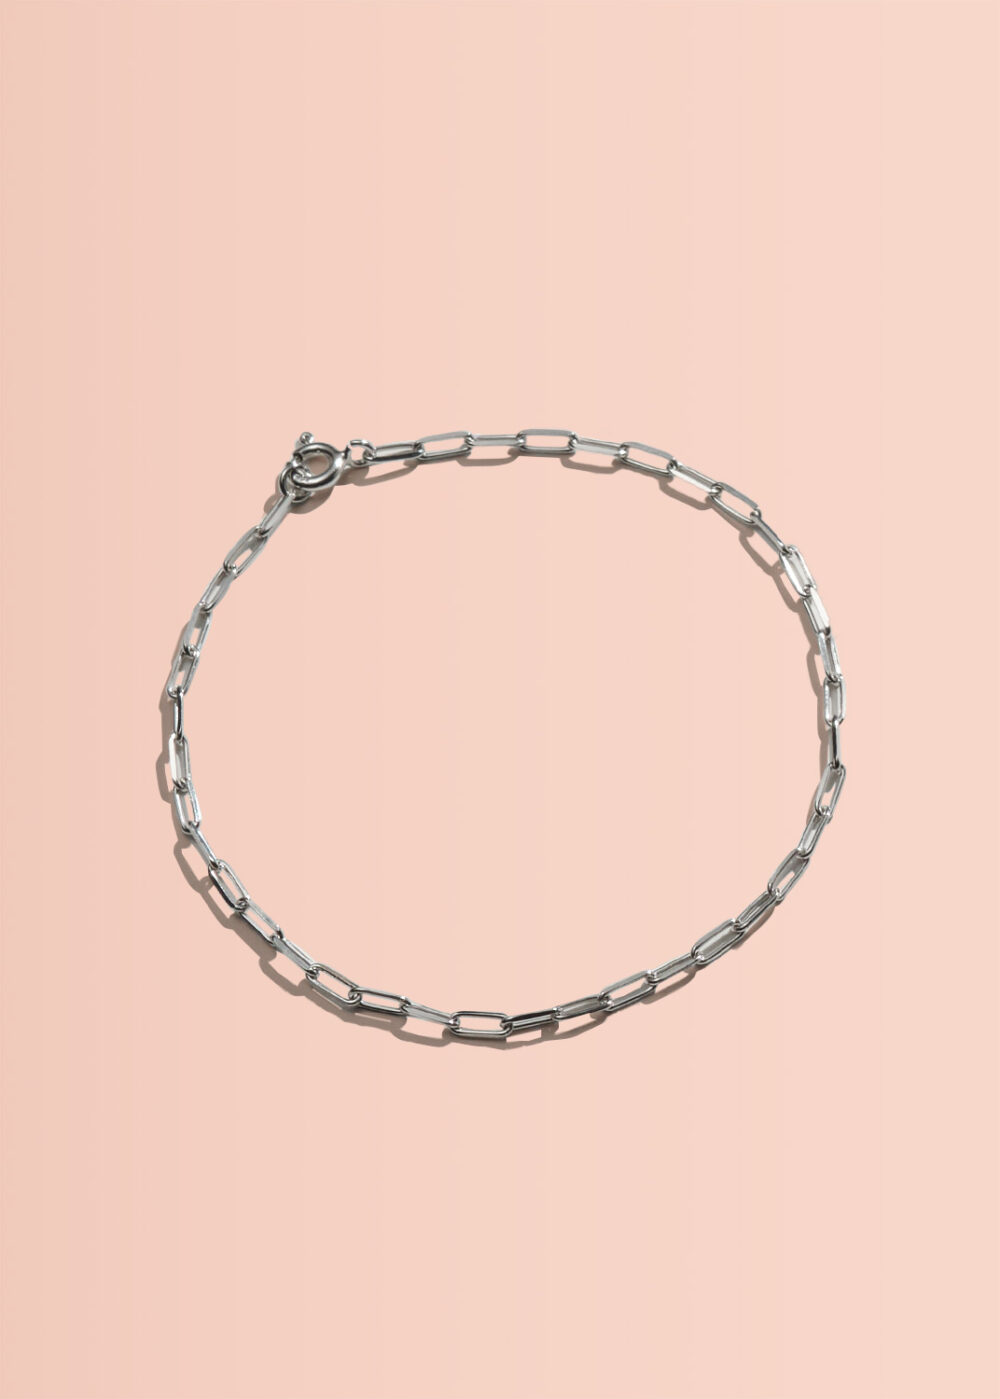 Medea-Ketten-Armband-fein-minimal-silber